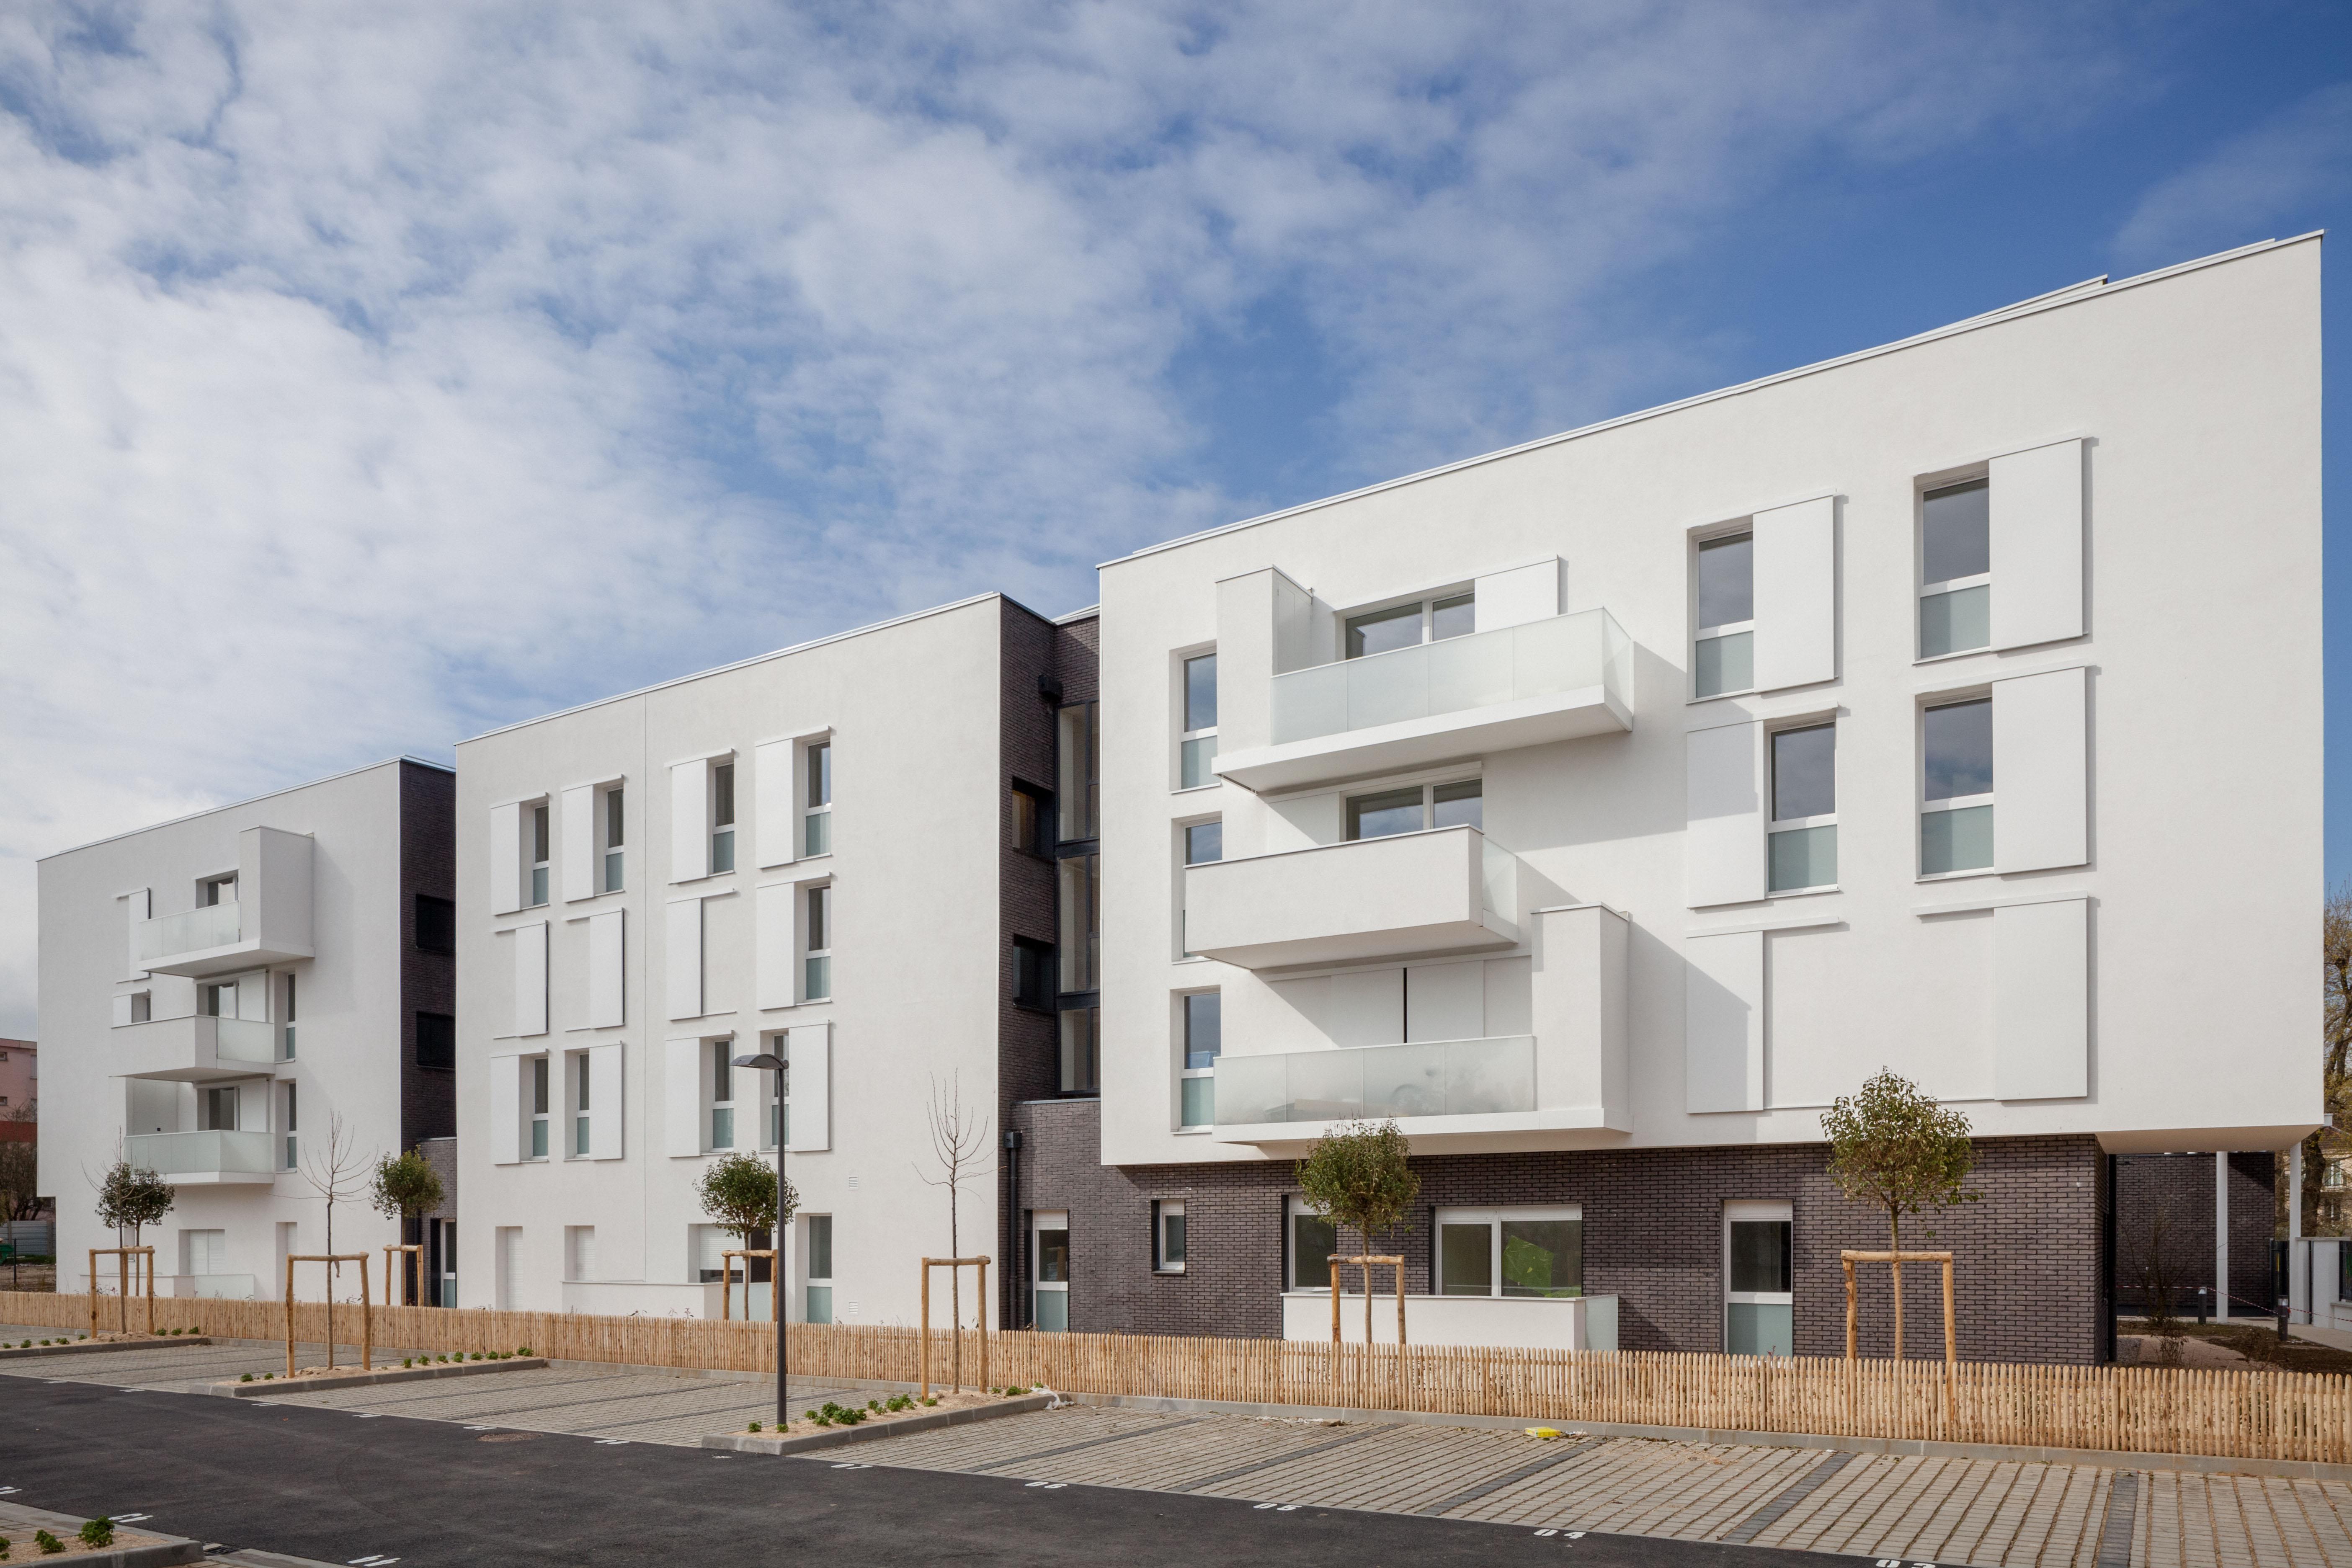 emmaus-habitat-inauguration-1-residence-jules-ferry-noisy-26-10-2016